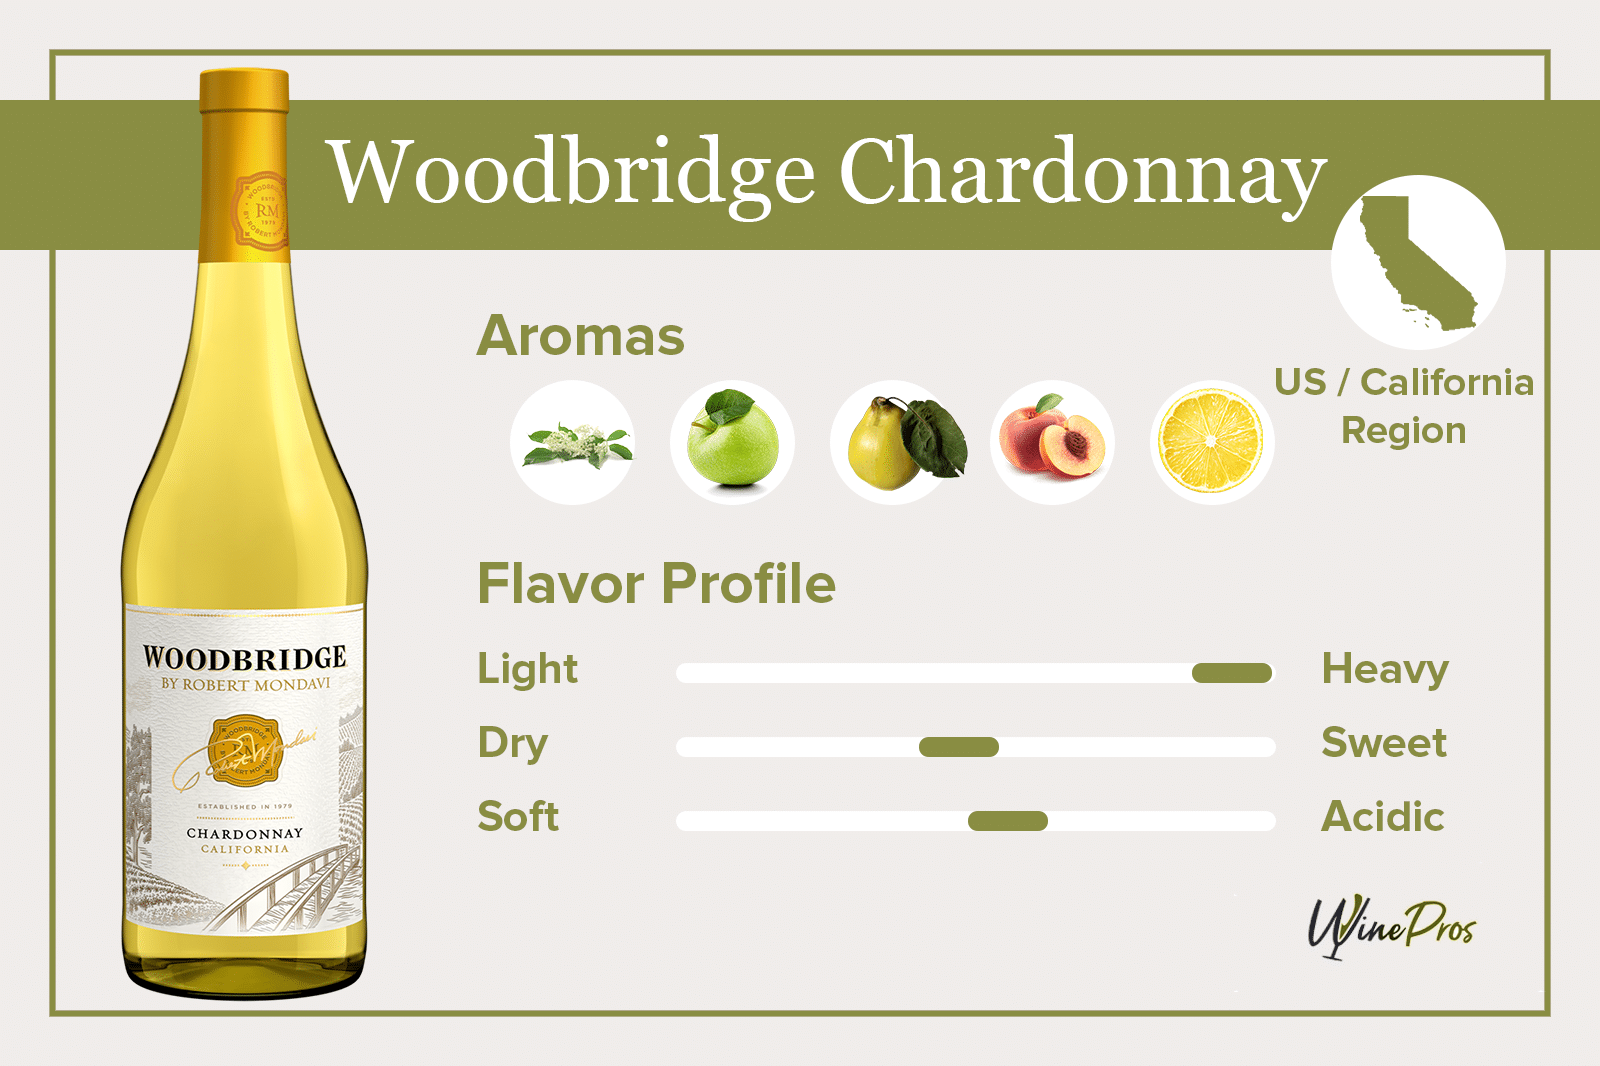 Woodbridge Chardonnay Review (2021)